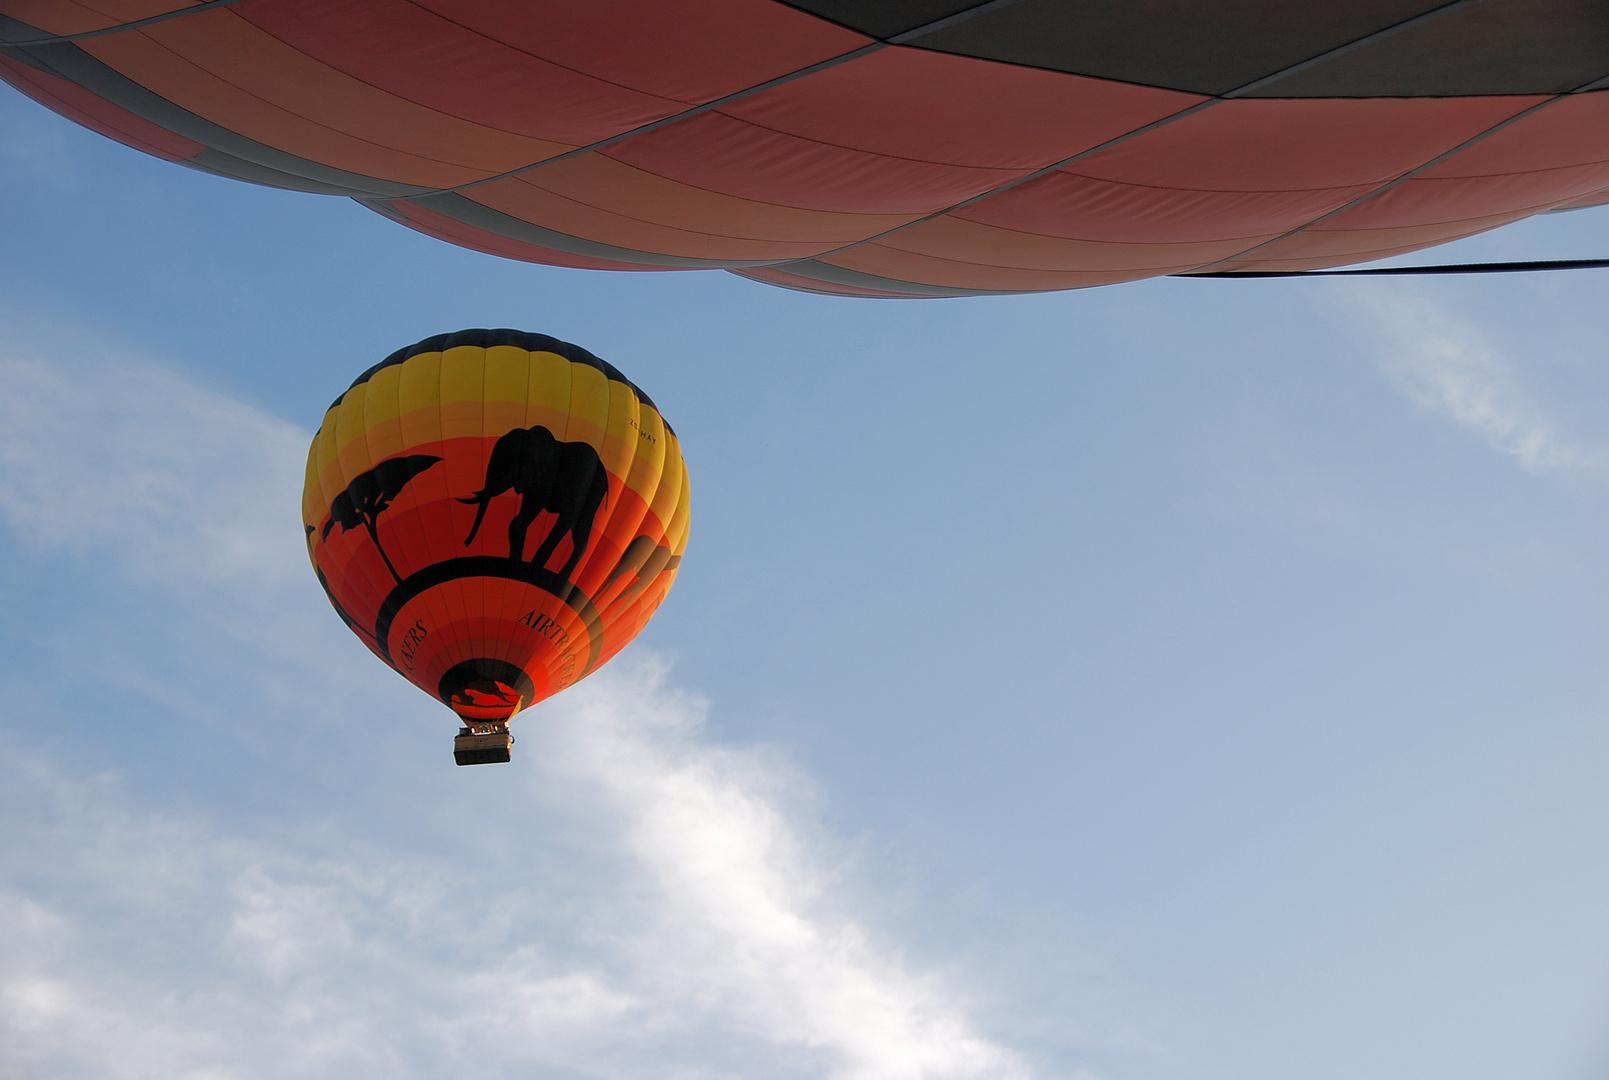 Freiheit im Heißluftballon